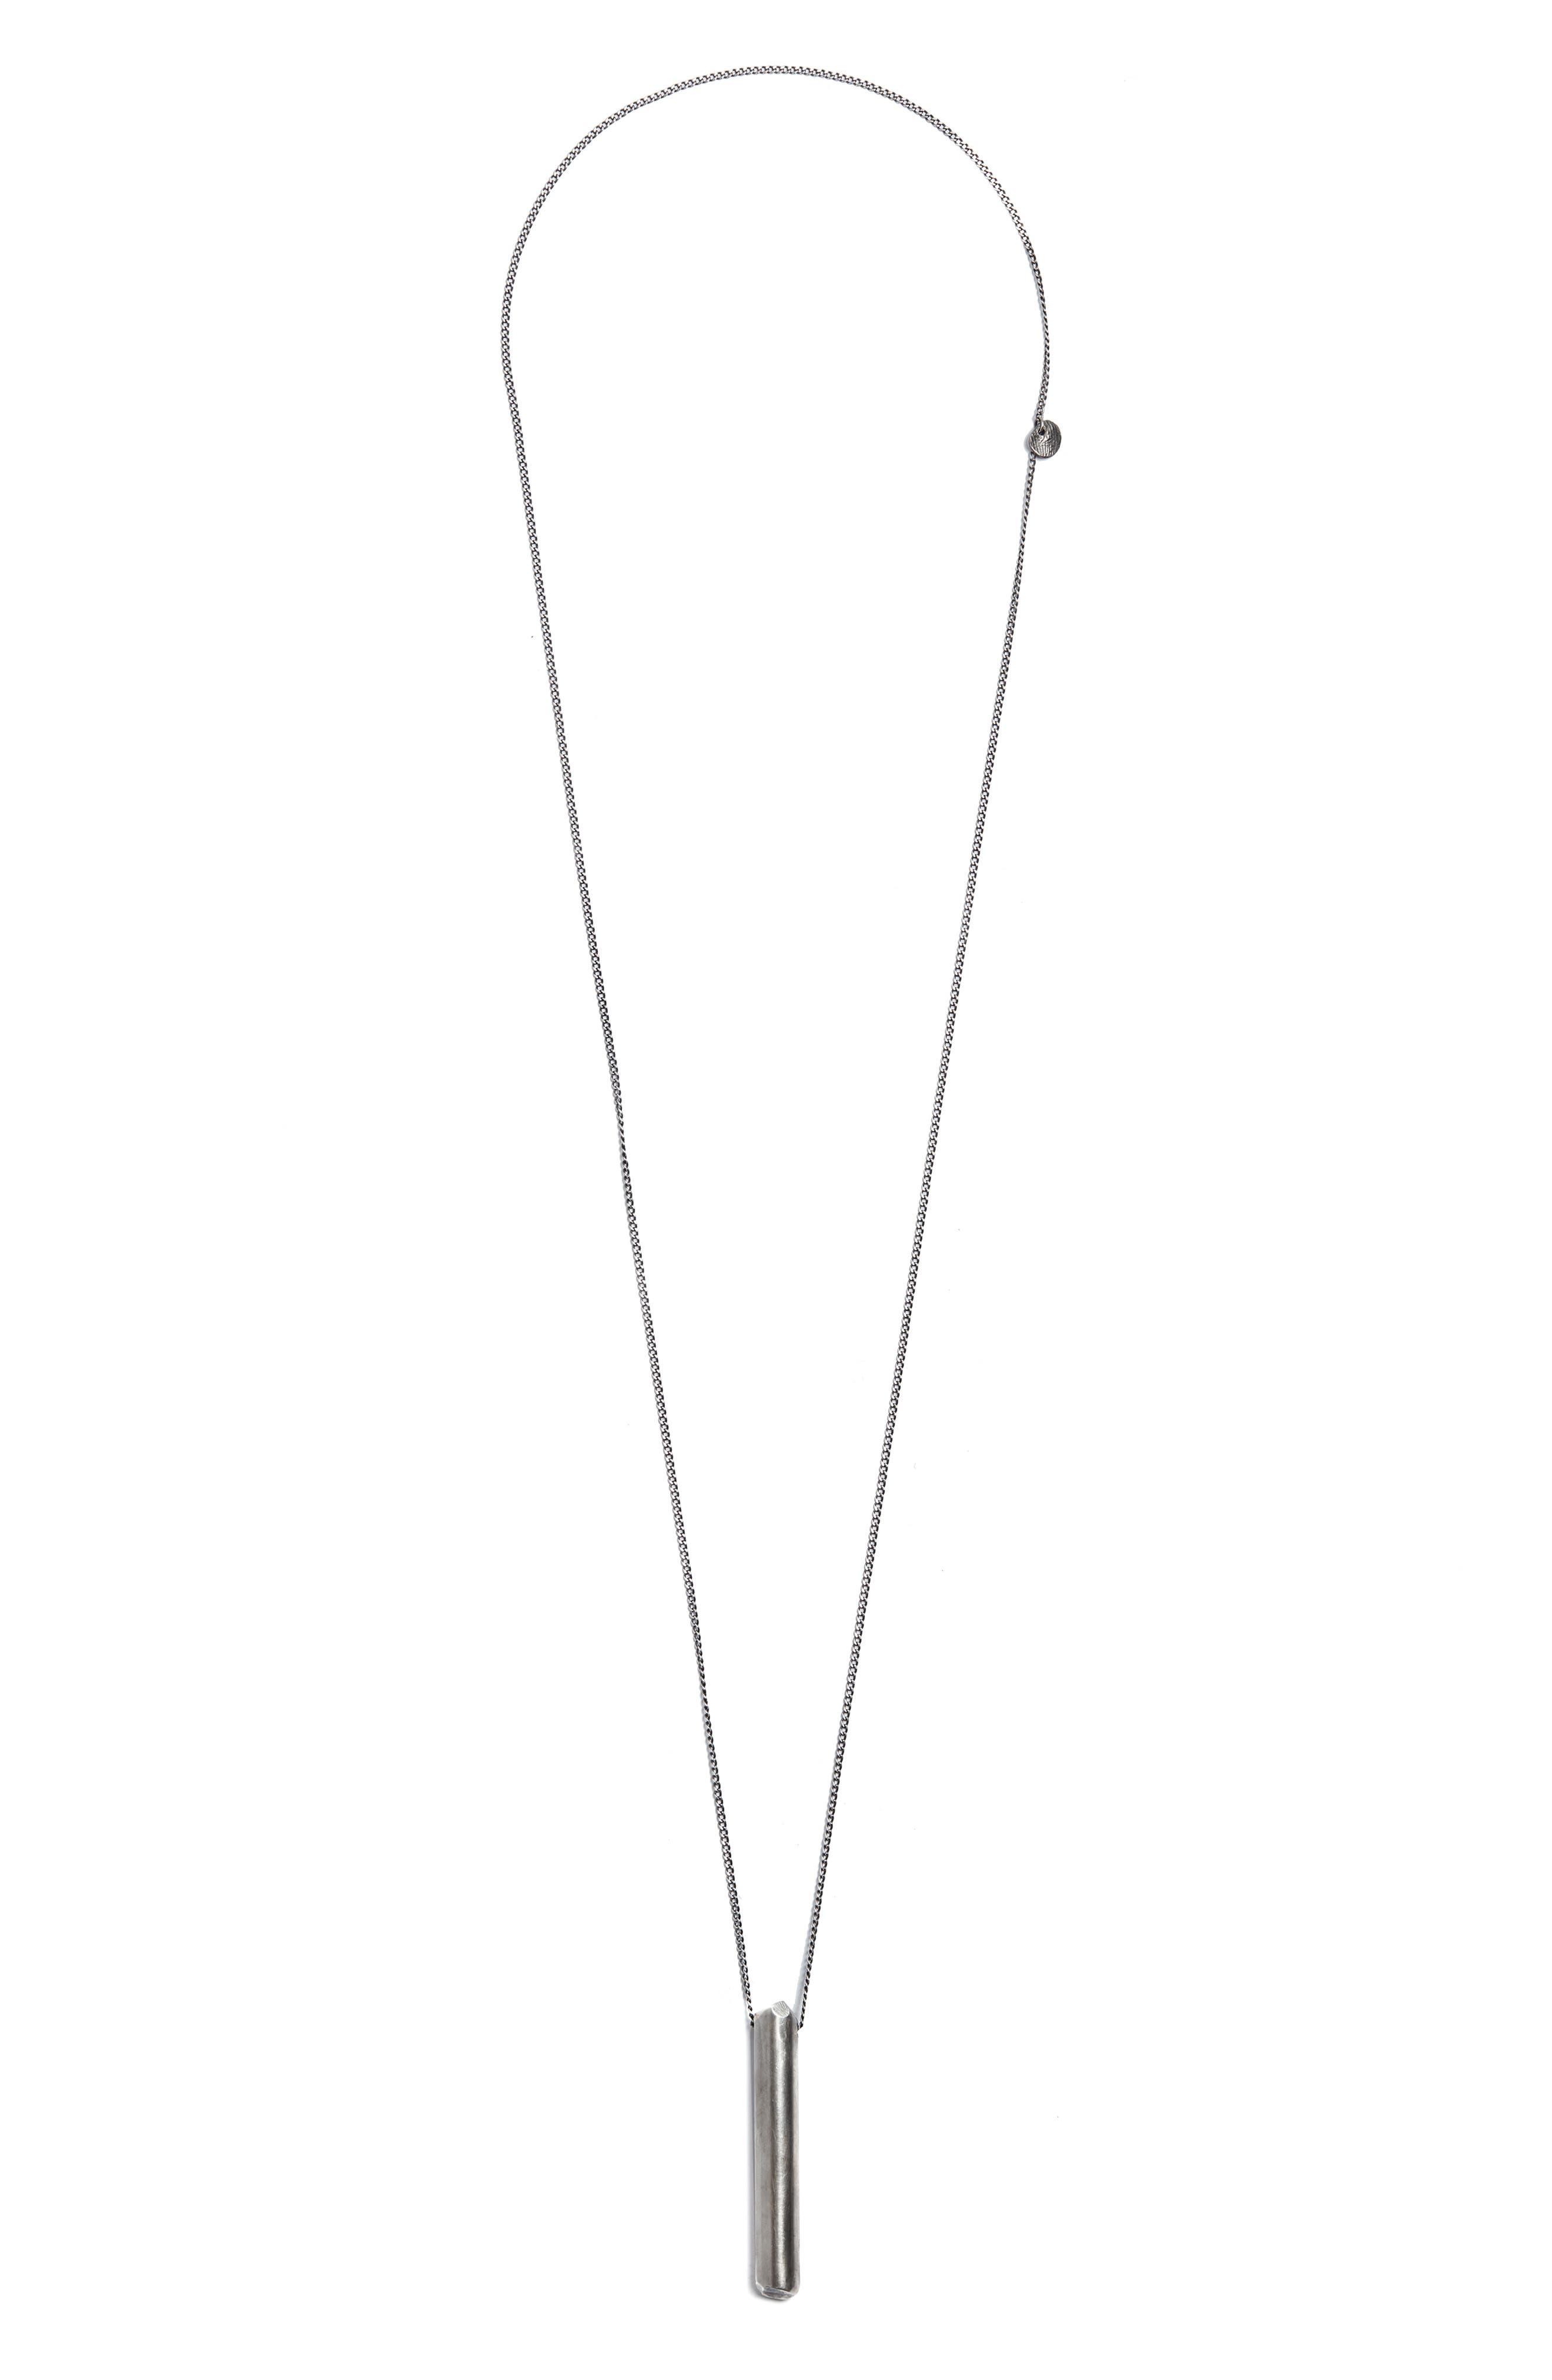 Rod Pendant Necklace,                             Main thumbnail 1, color,                             Silver